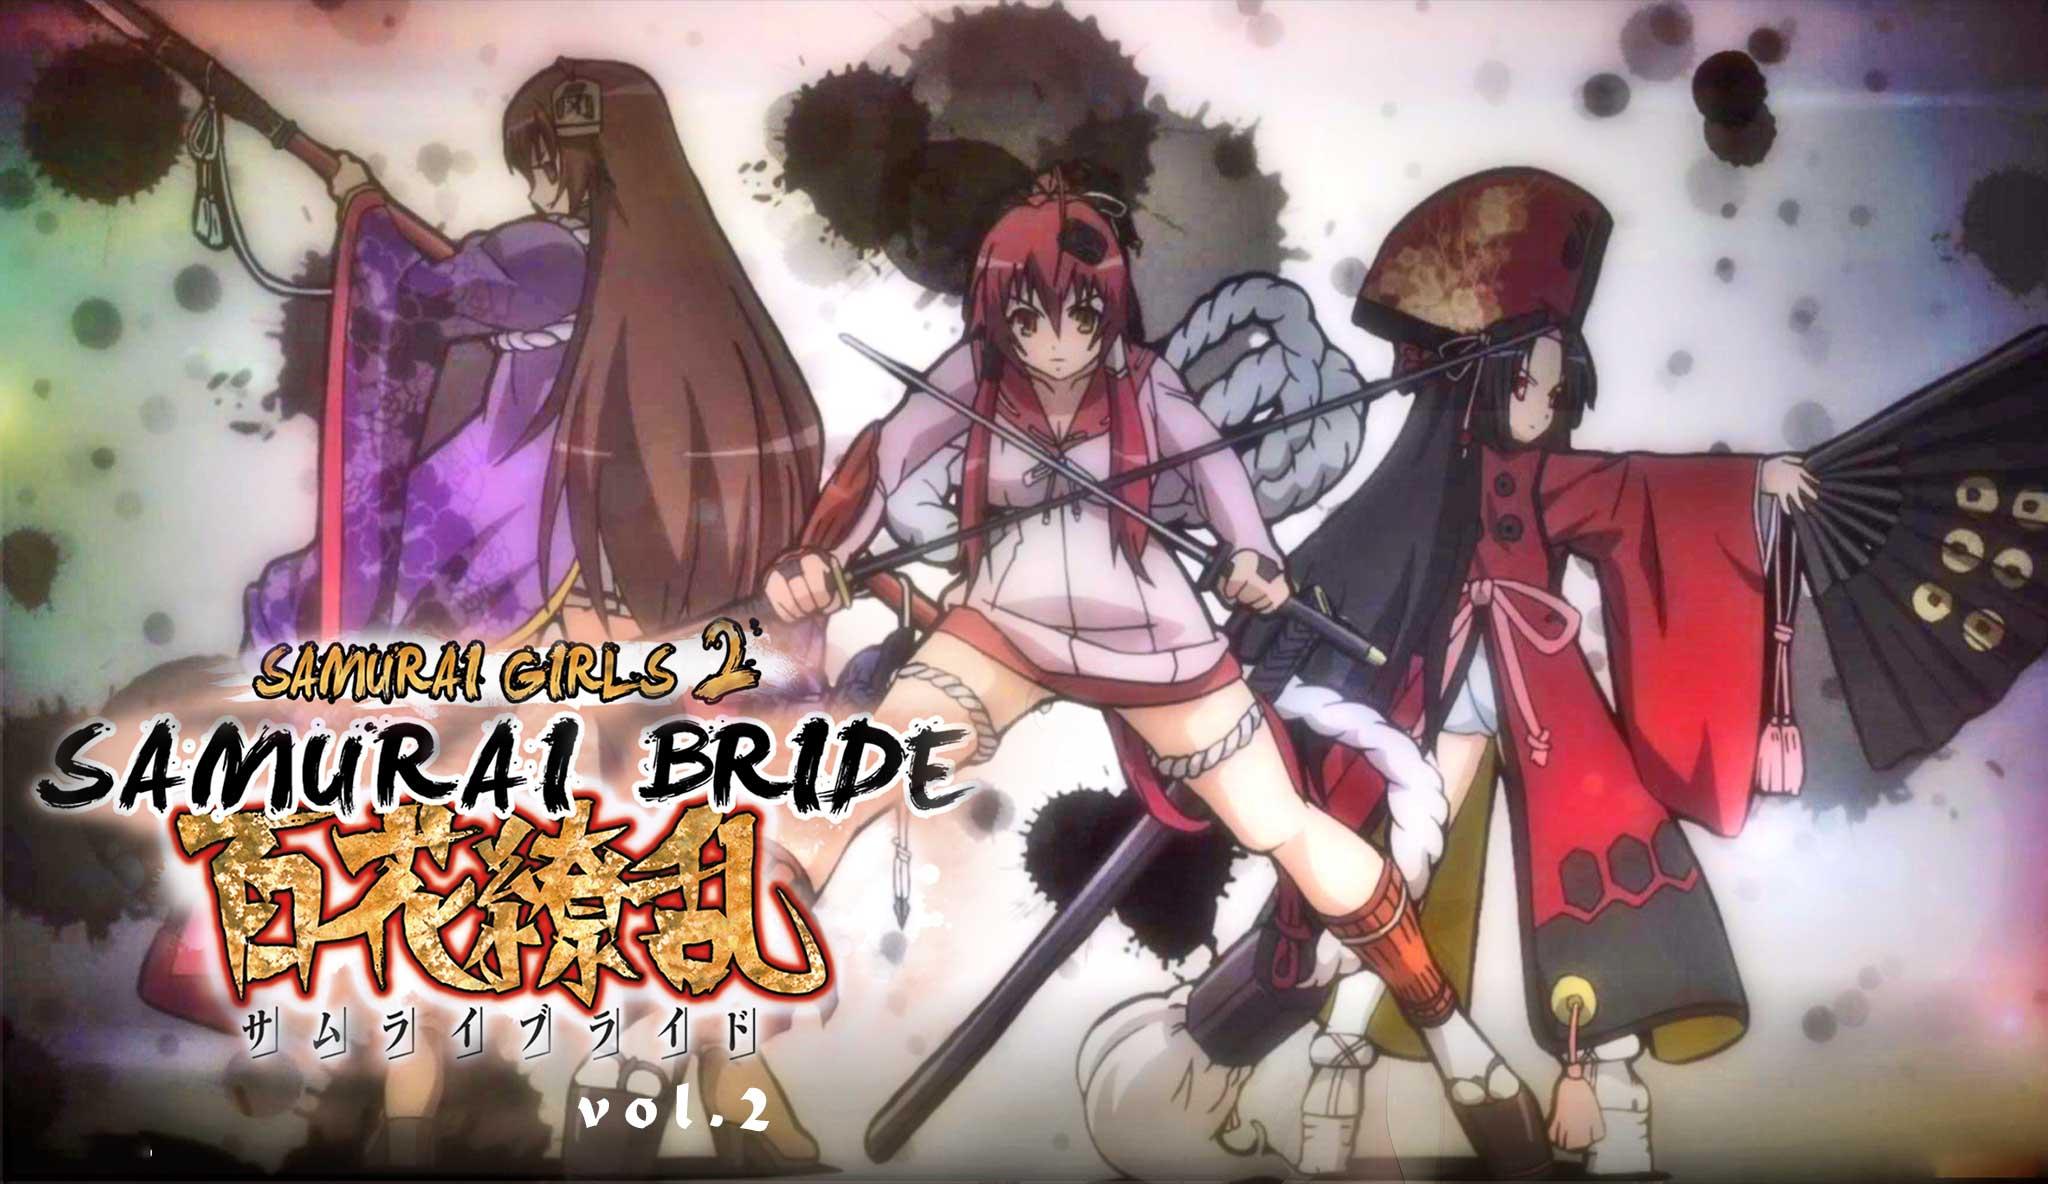 samurai-girls-2-samurai-bride-episode-4-6\header.jpg